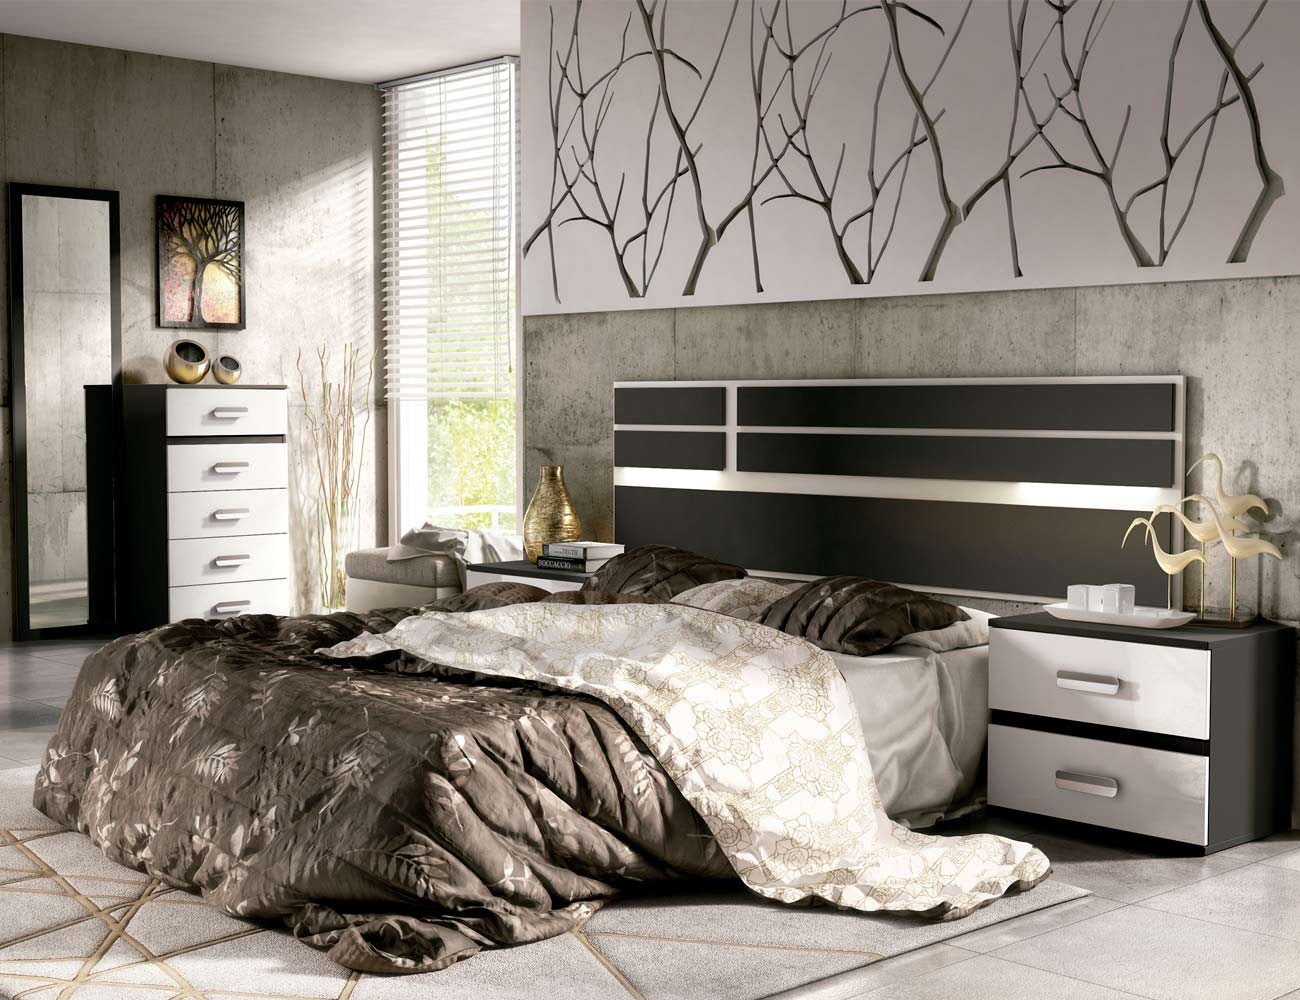 04 dormitorio matrimonio cabecero luces leds sinfonier mural grafito blanco